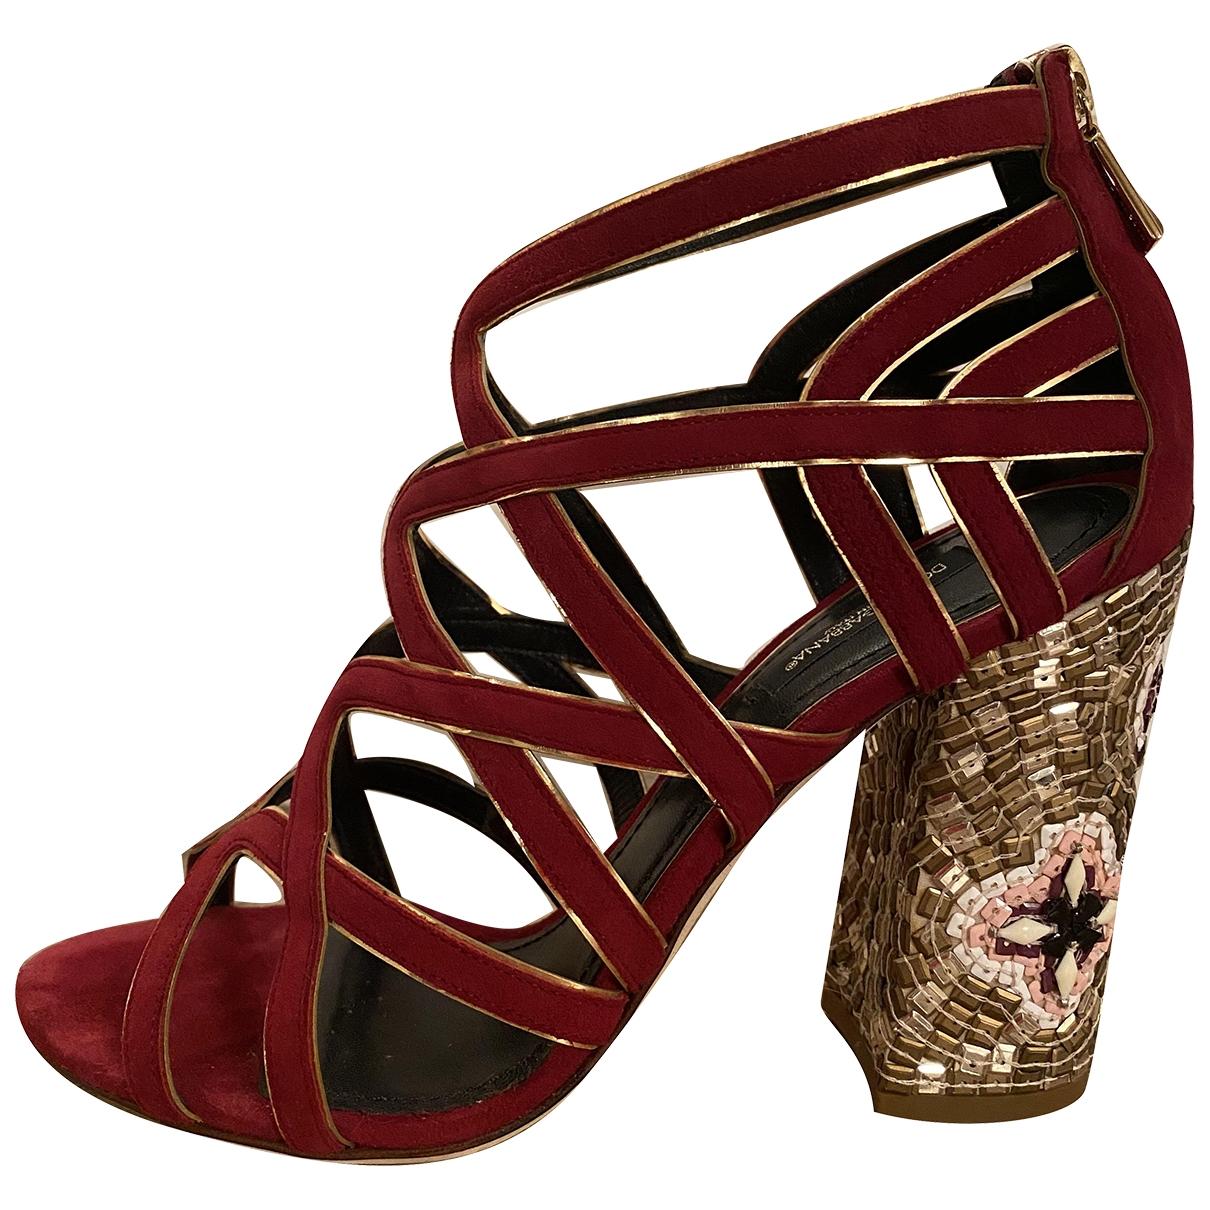 Dolce & Gabbana \N Burgundy Suede Sandals for Women 39 EU